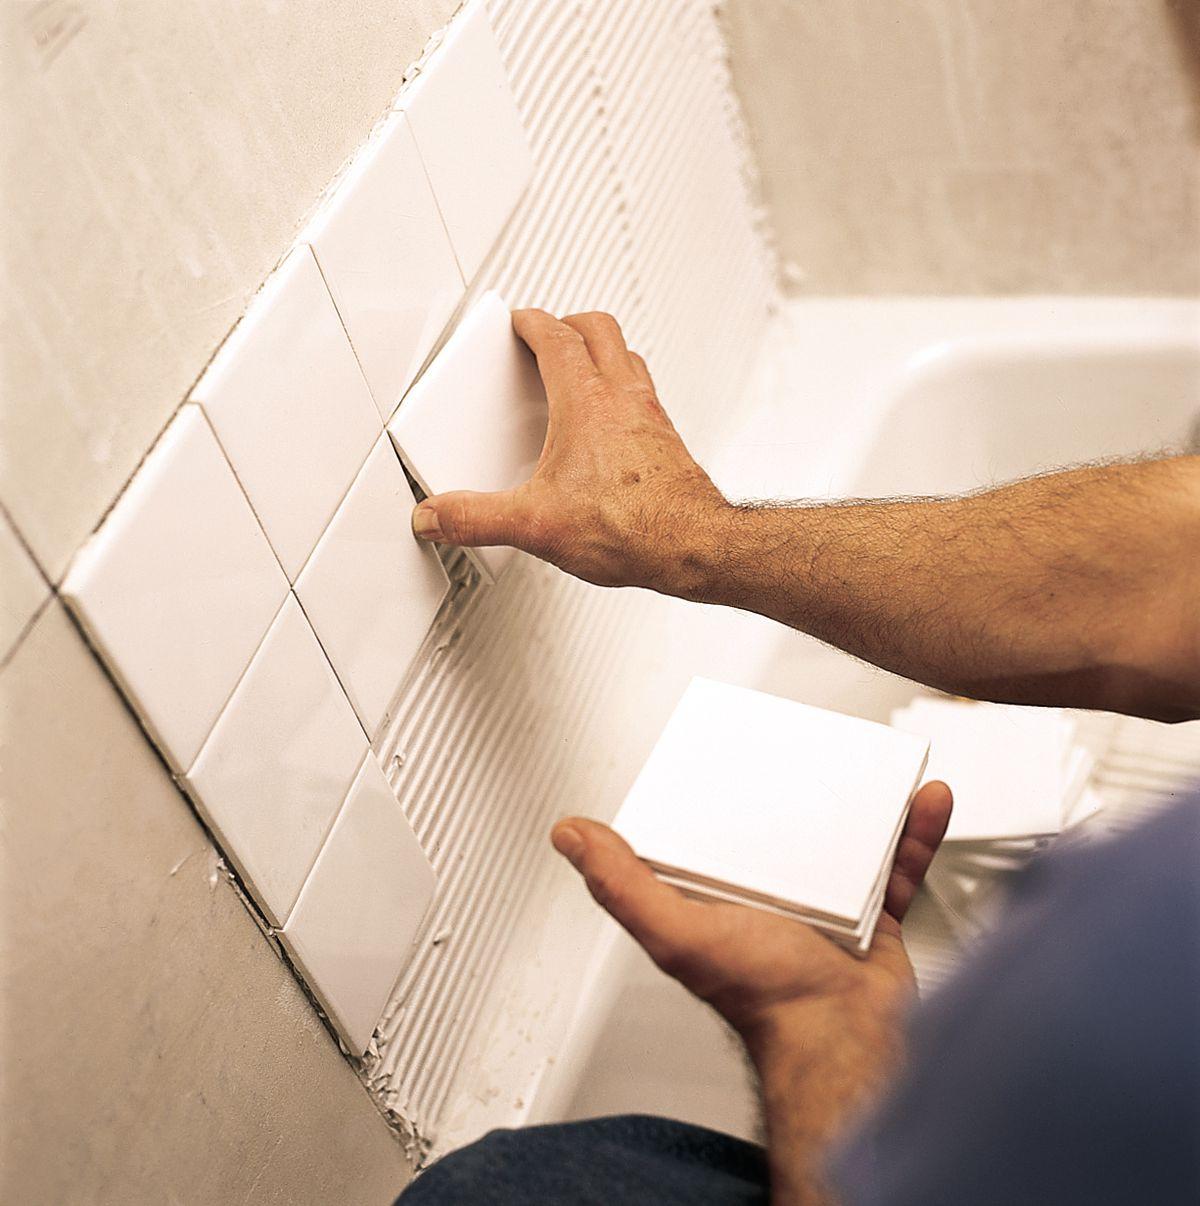 Man Installs Ceramic Tiles Onto Tile Mastic